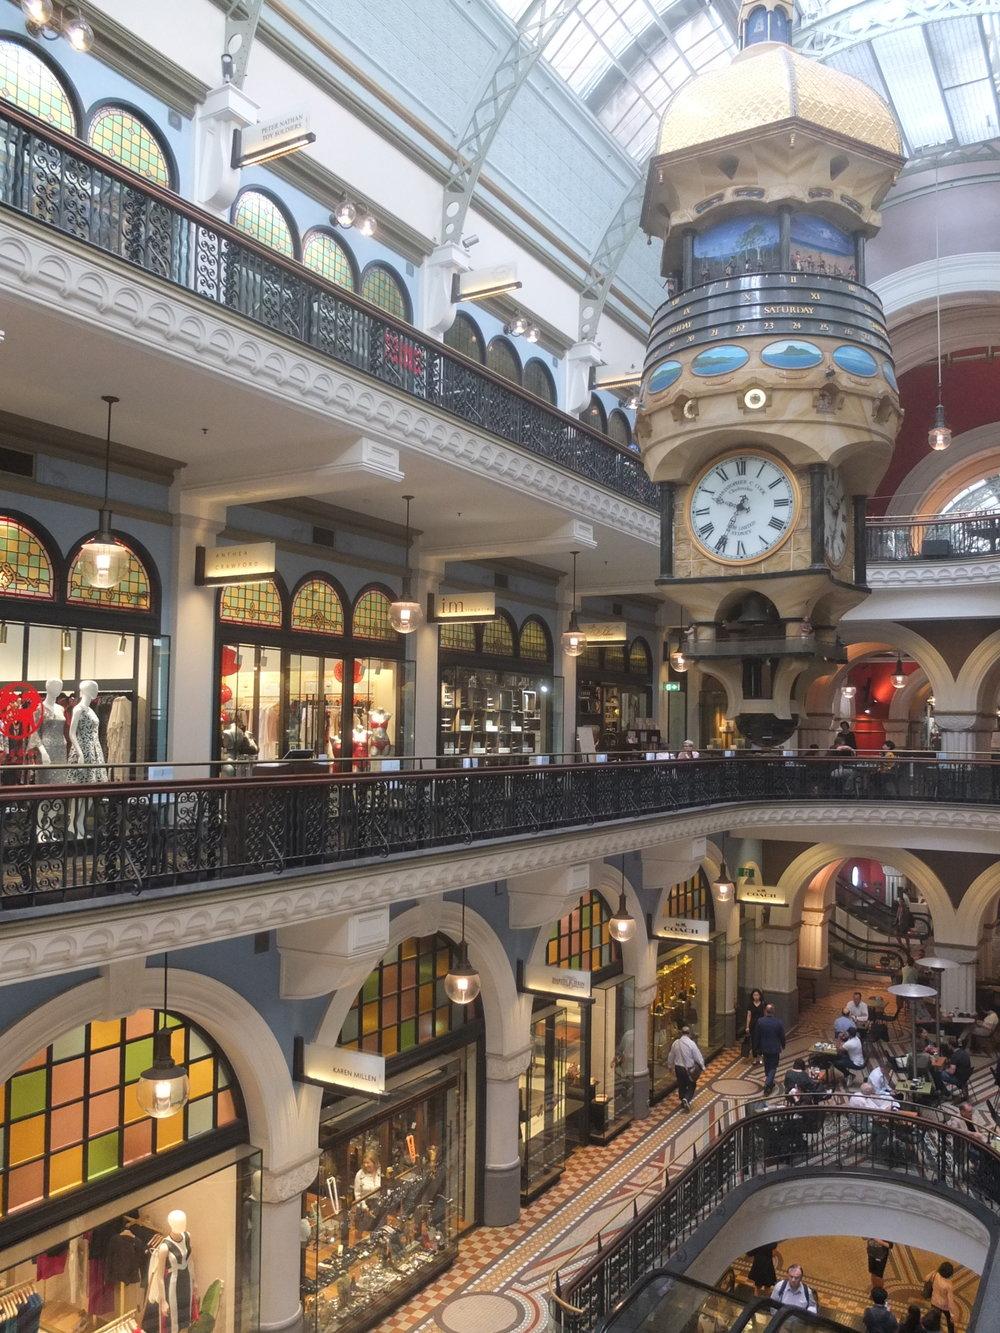 Australias Beautiful Shopping Arcades   The Down Under Series   The Strand Clock   jumpseatjenny   Sydney, NSW